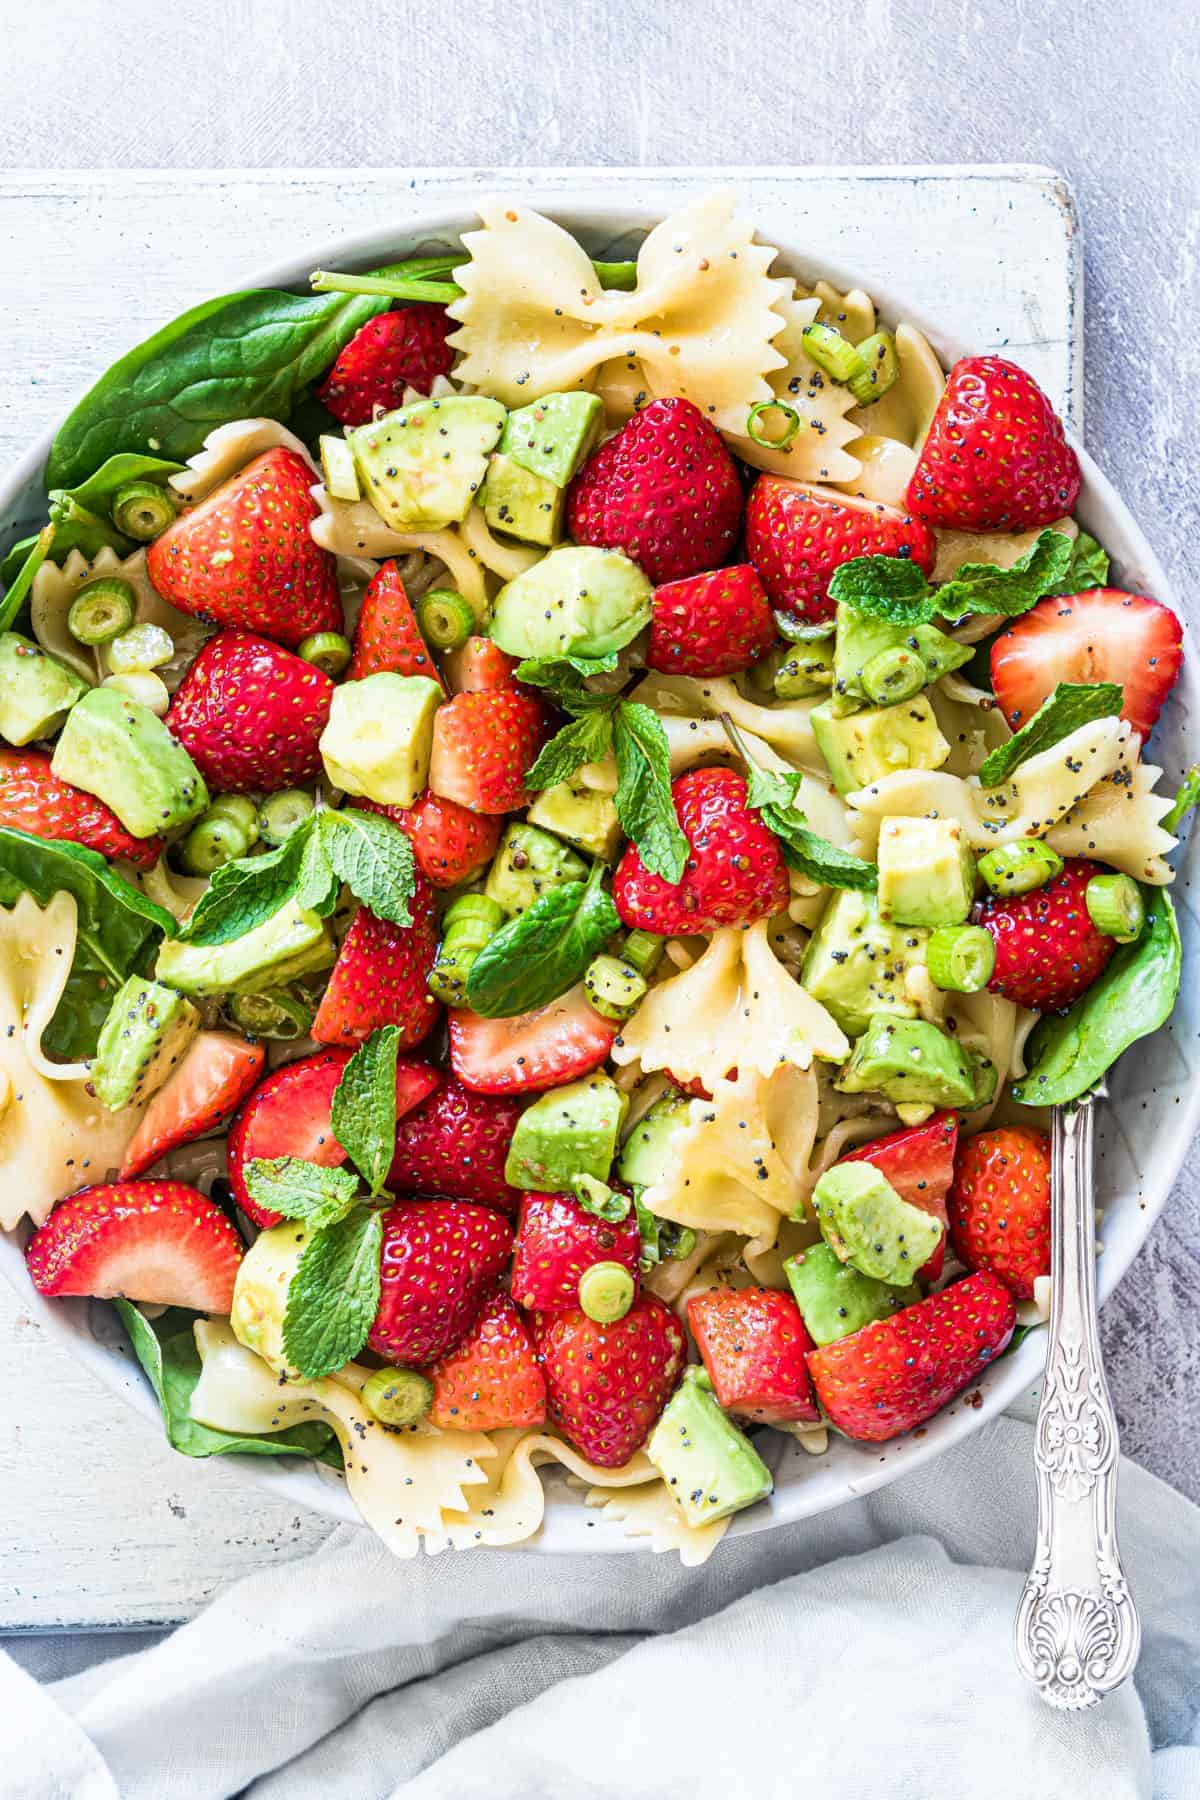 strawberry avocado pasta salad 12 of 21 1